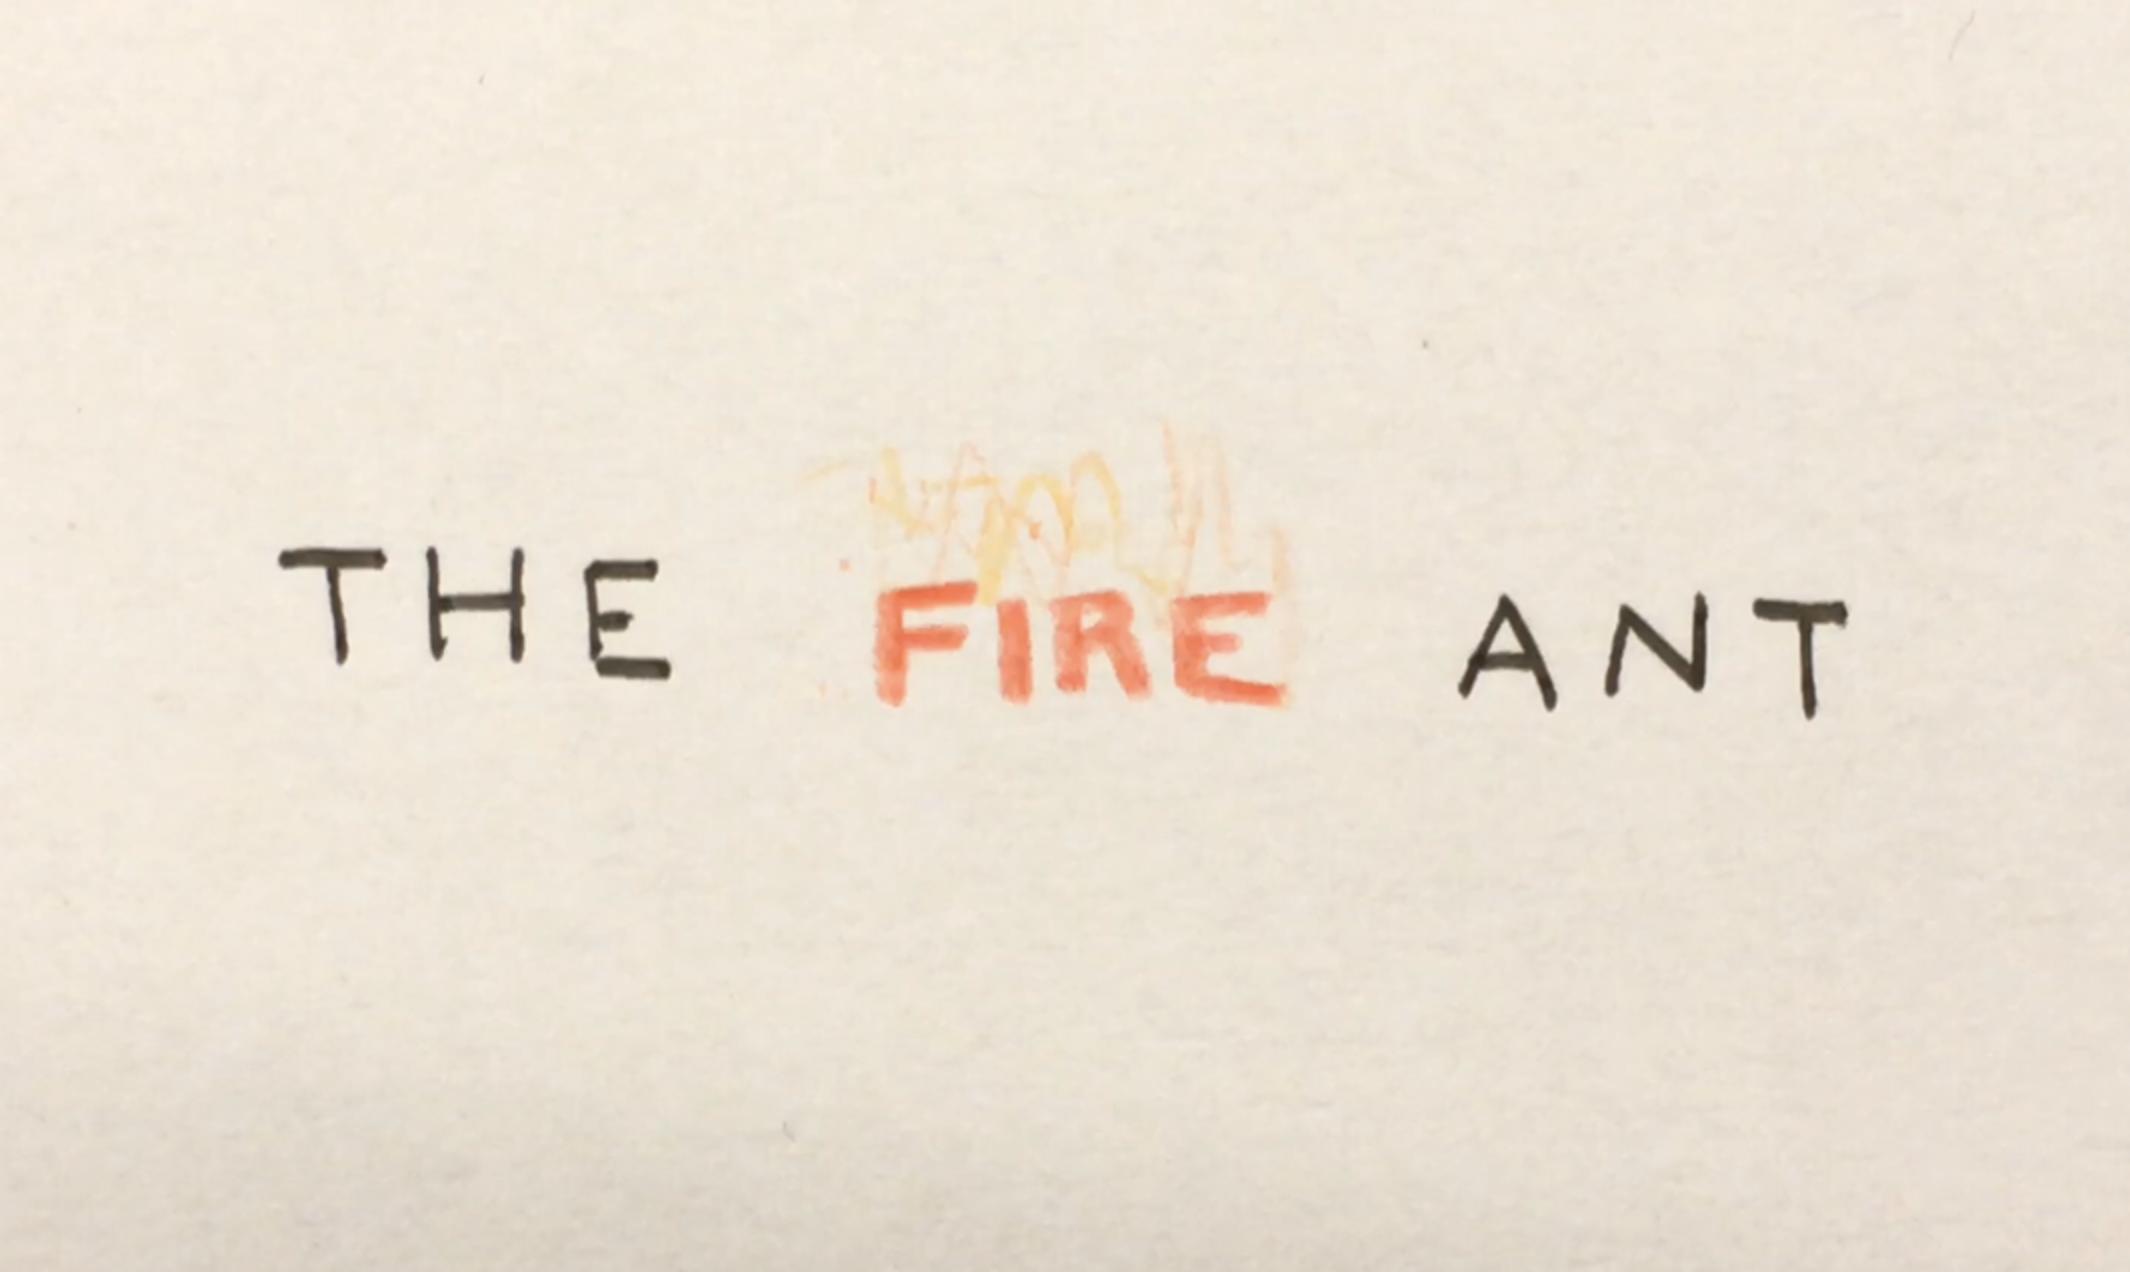 Project 1: Flipbook Animation